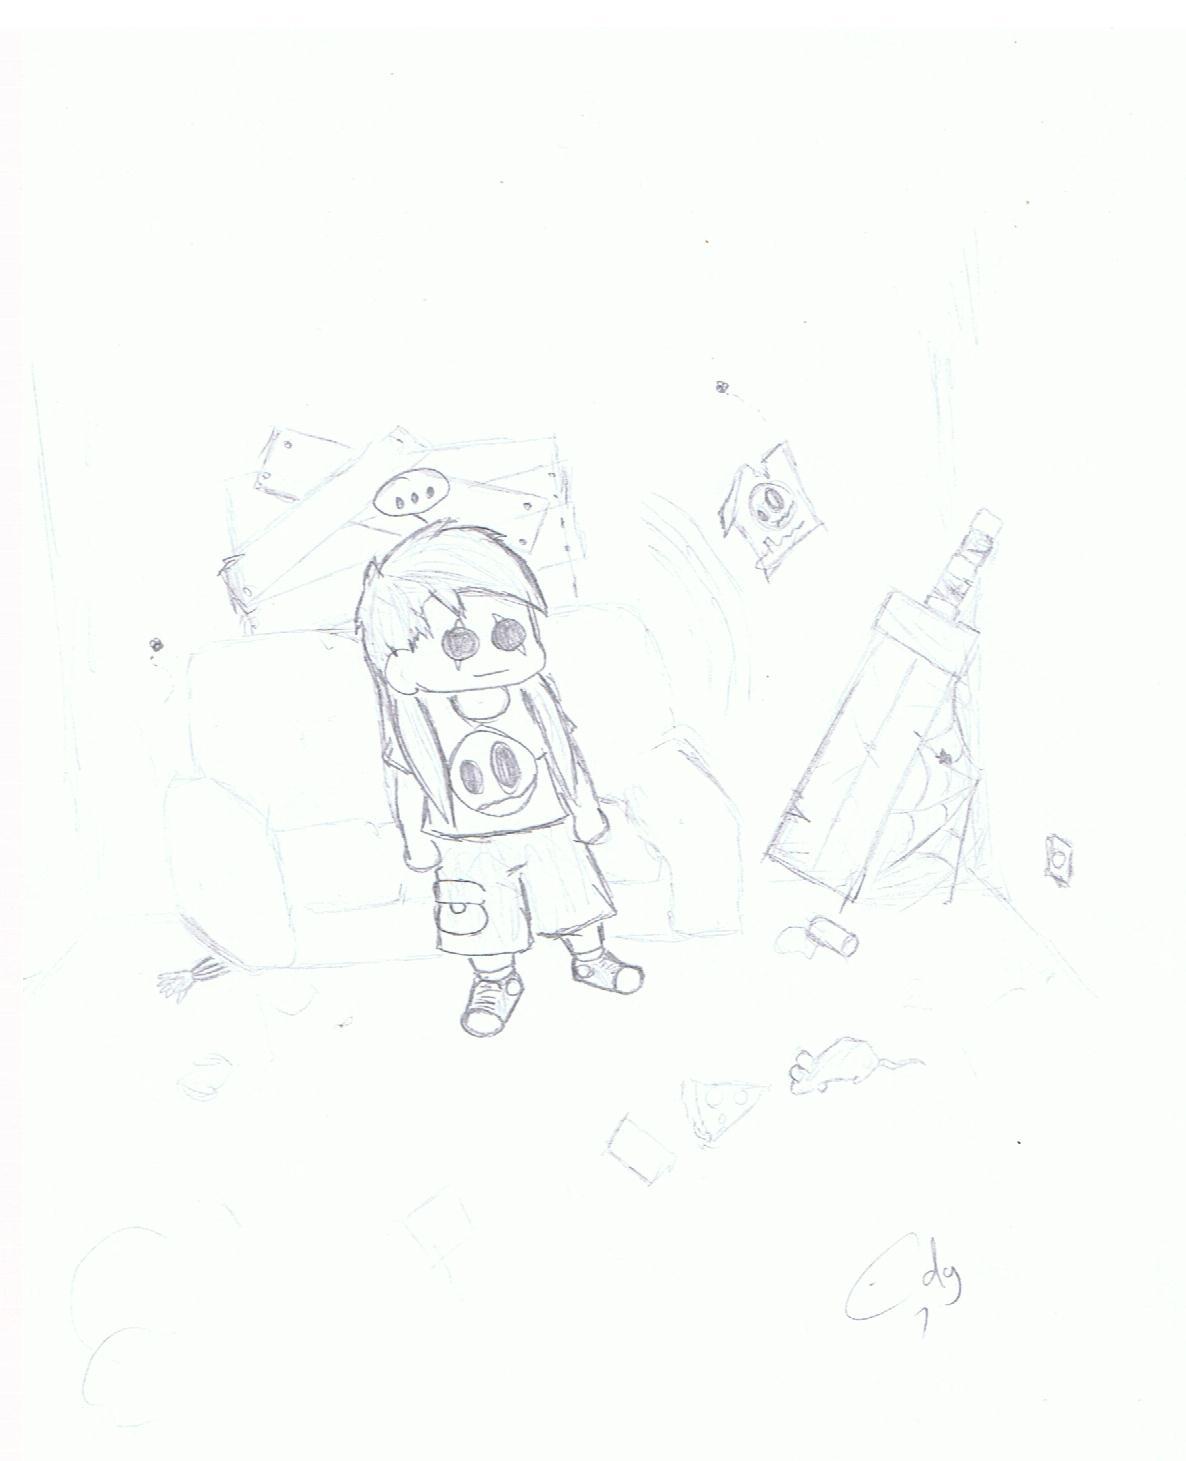 edy's sketch1